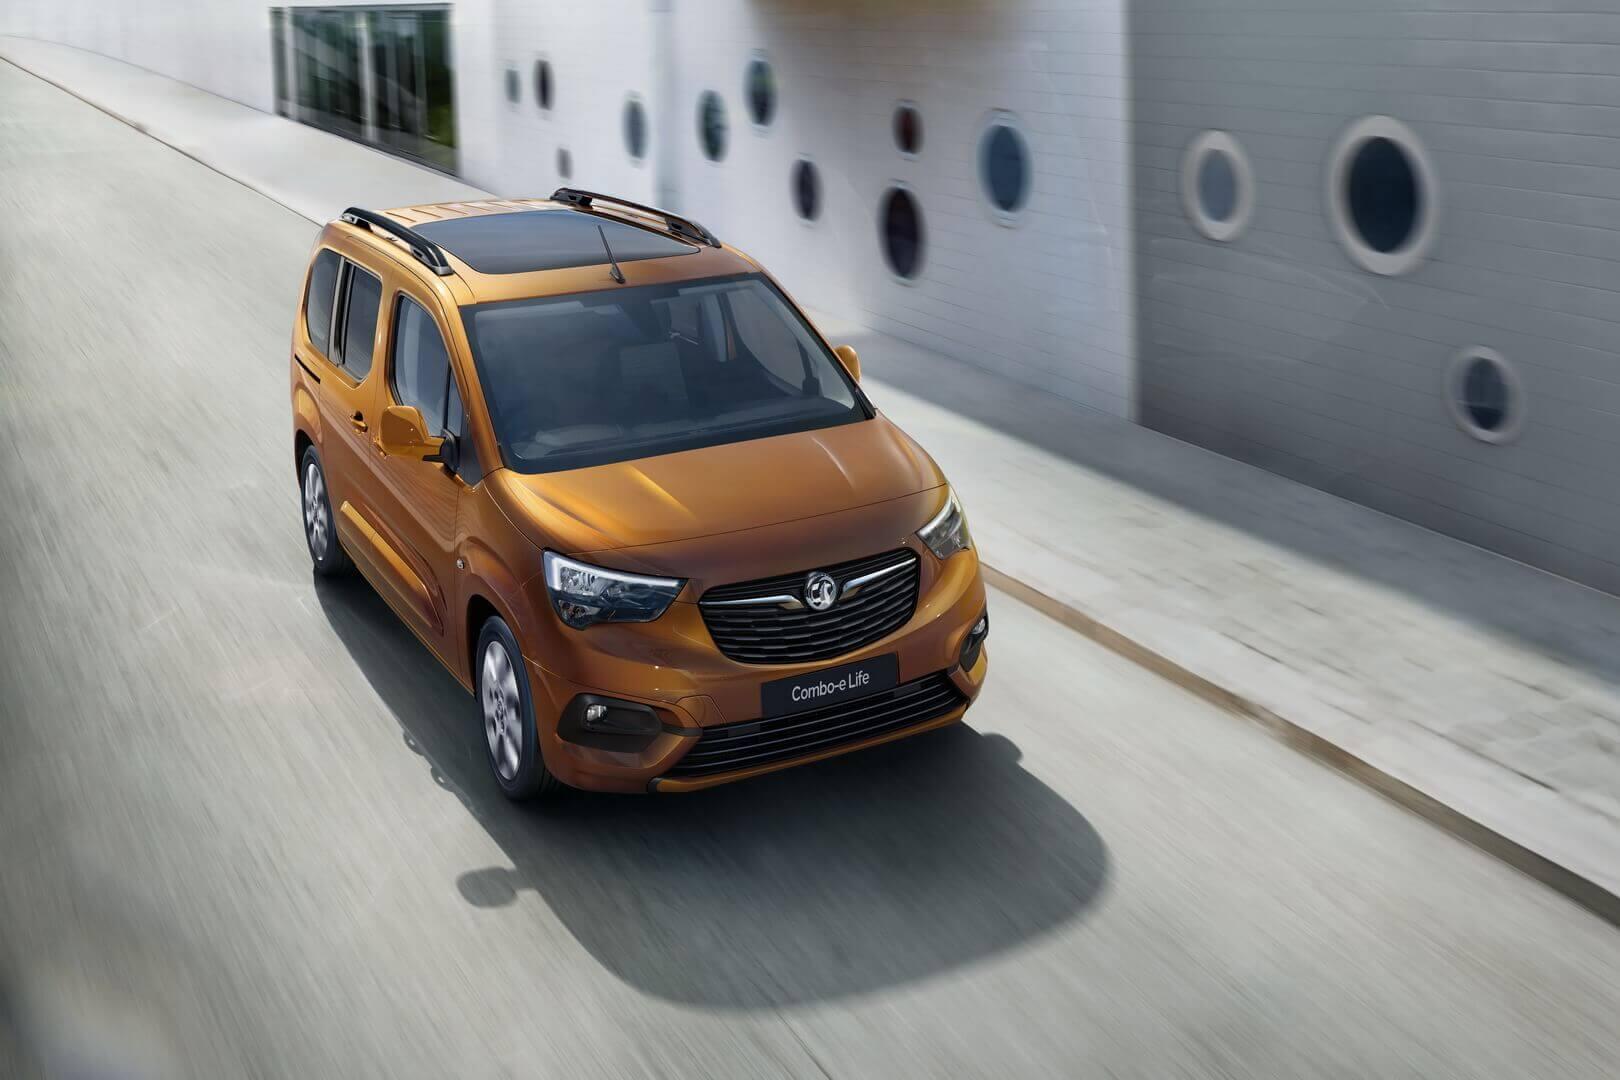 Электрический фургон Opel/Vauxhall Combo-e Life